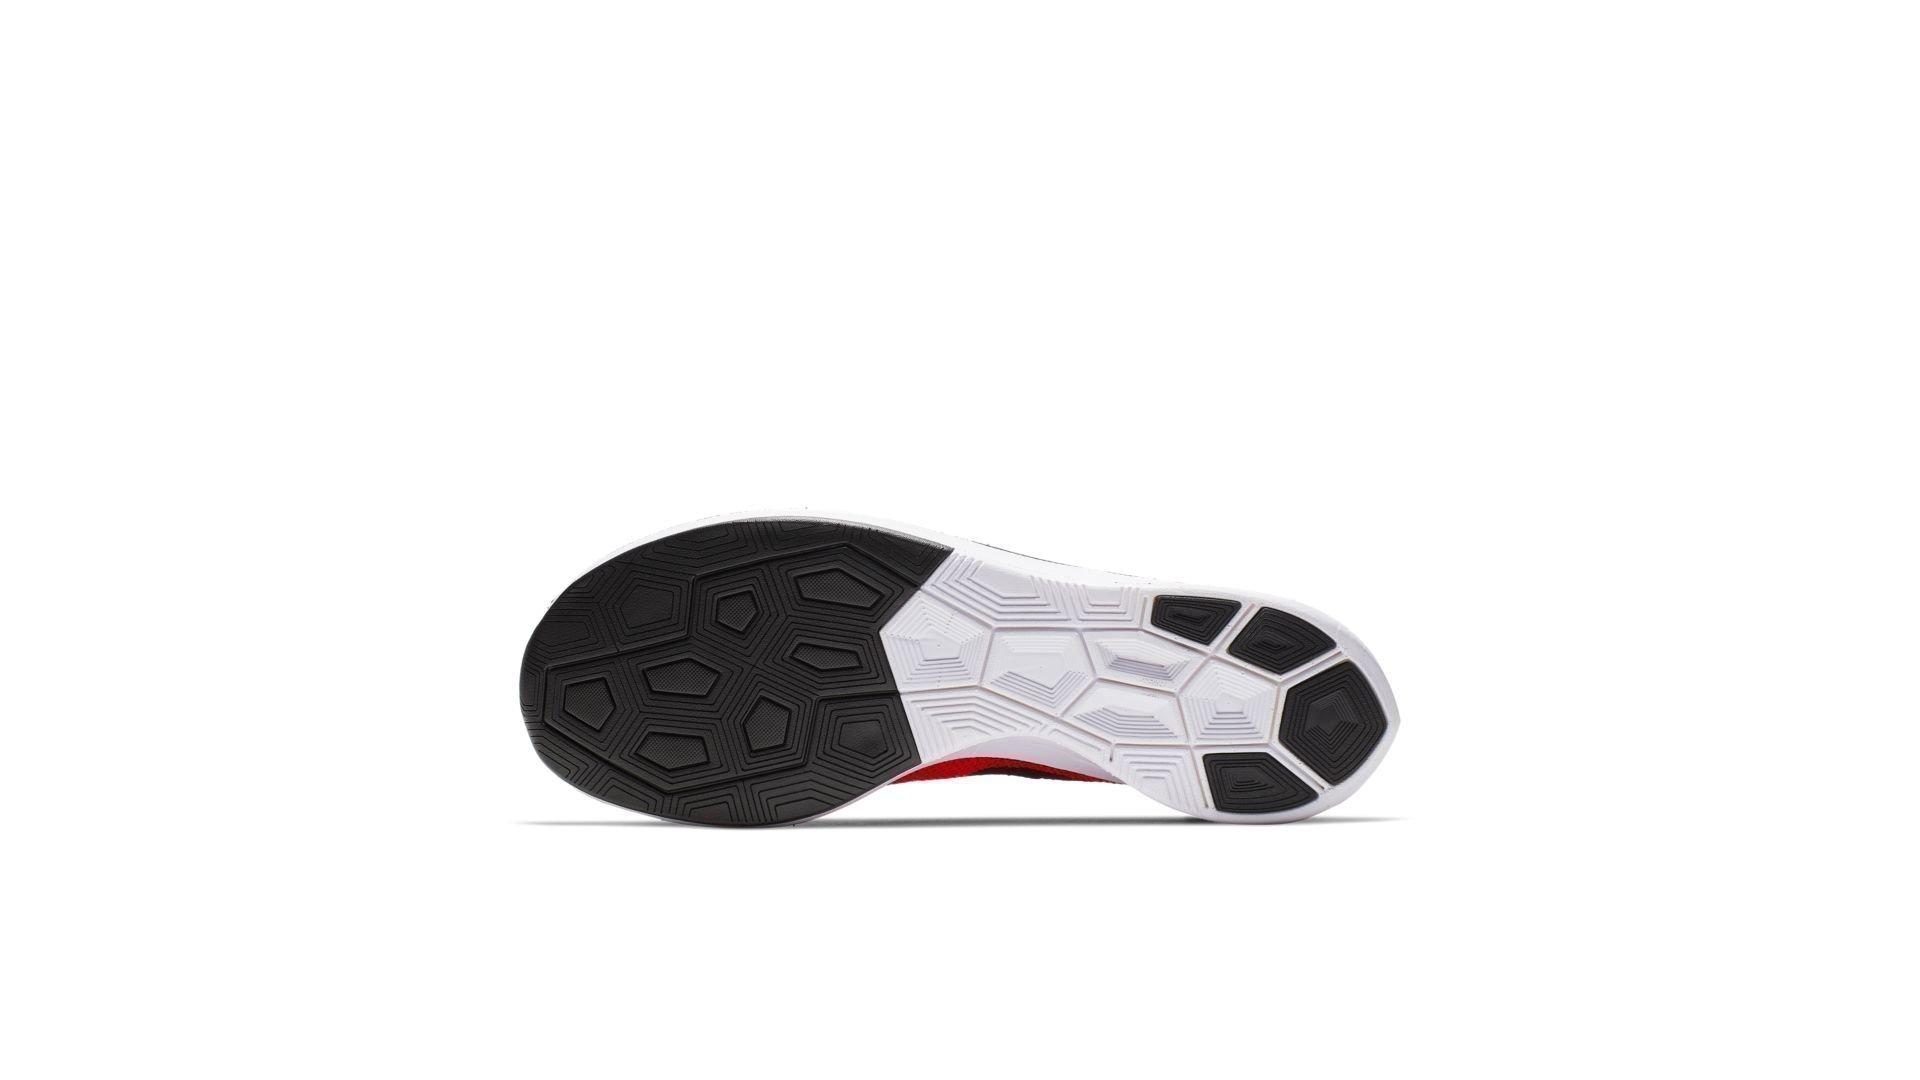 Nike VaporFly 4% Flyknit London Marathon (2019) (AJ3857-601)